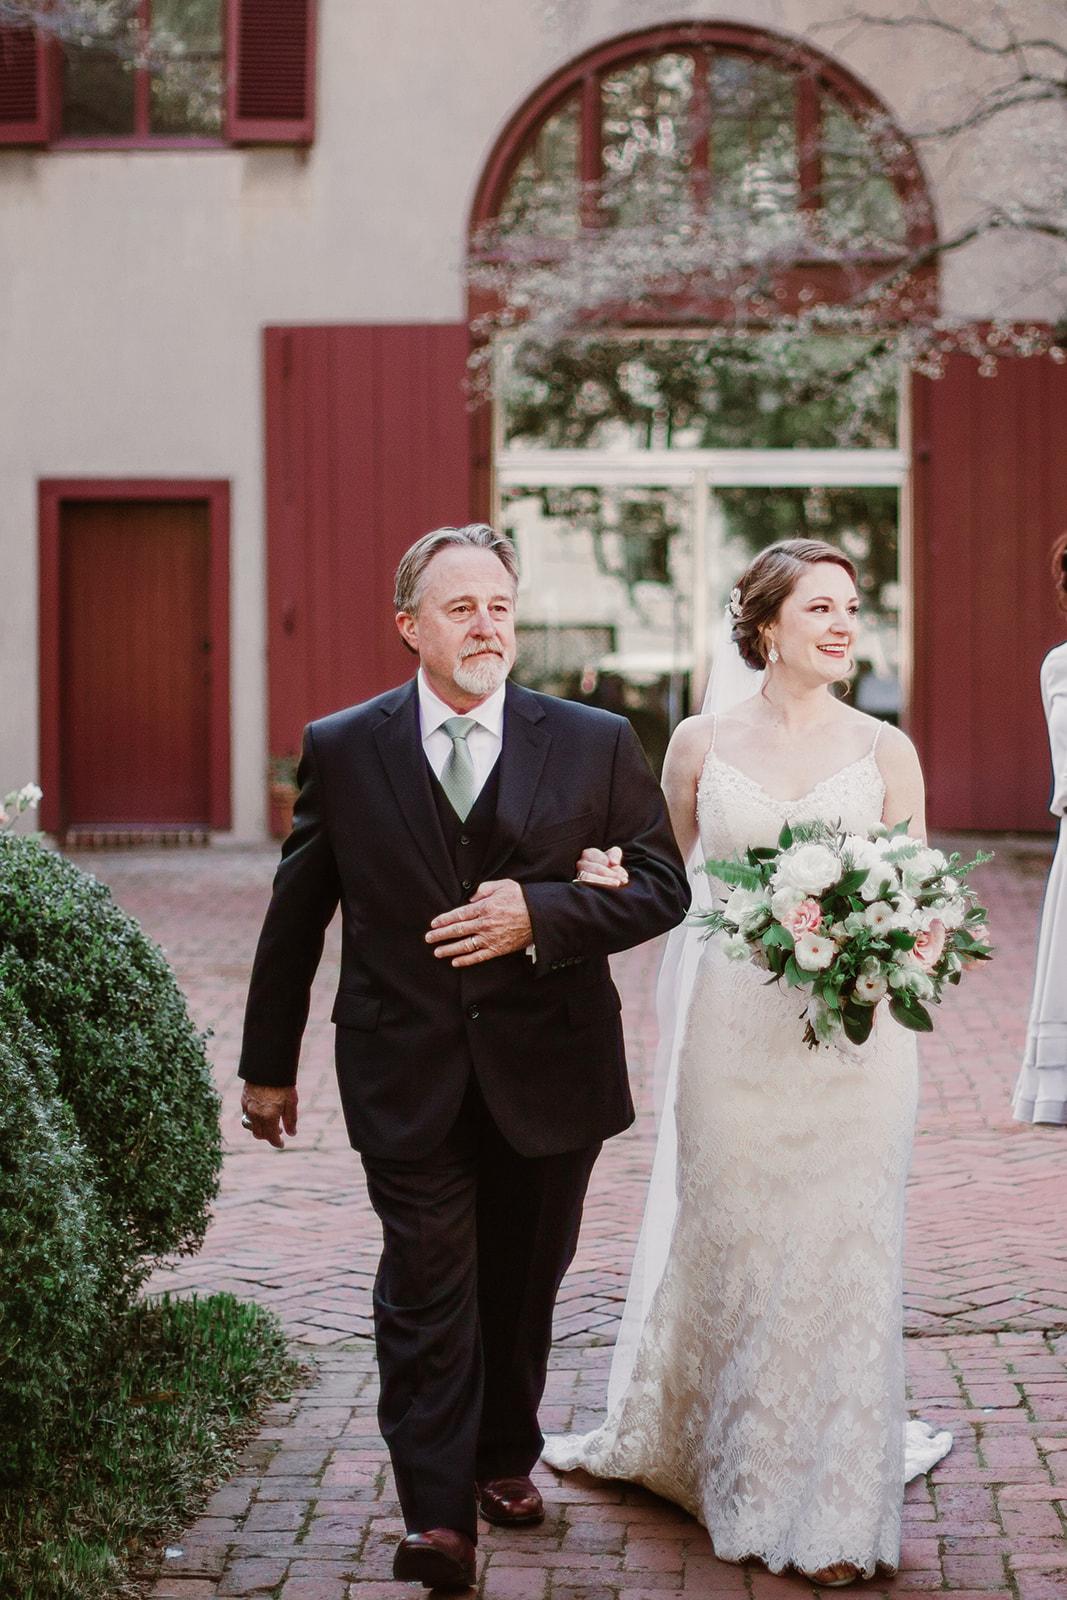 SarahMattozziPhotography-MaggieJustin-Ceremony-55.jpg